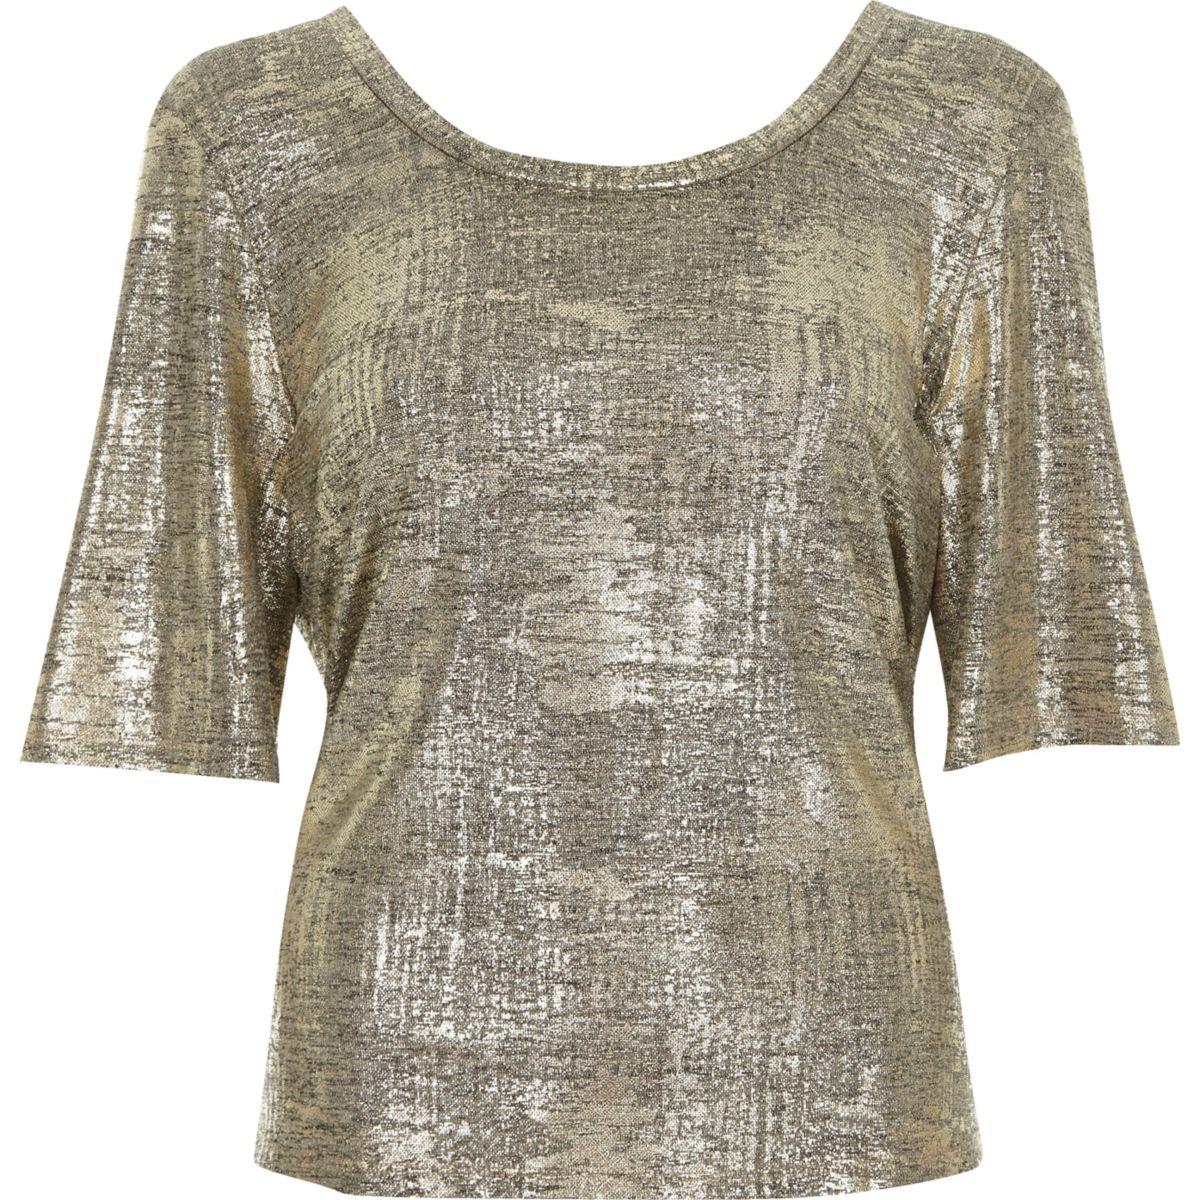 Gold metallic foil wrap back T-shirt